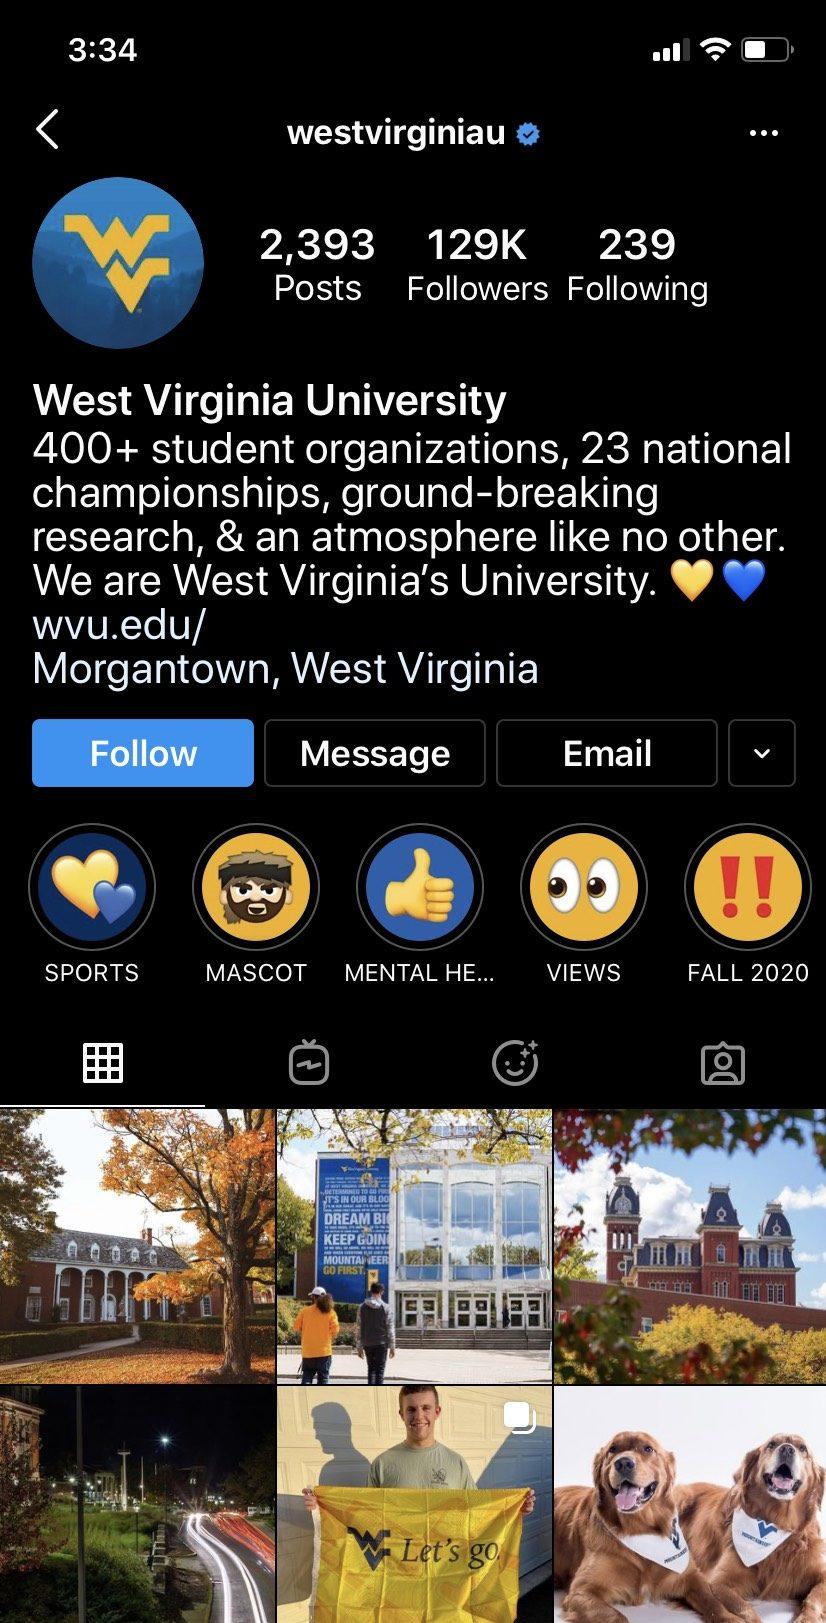 University's Instagram Page